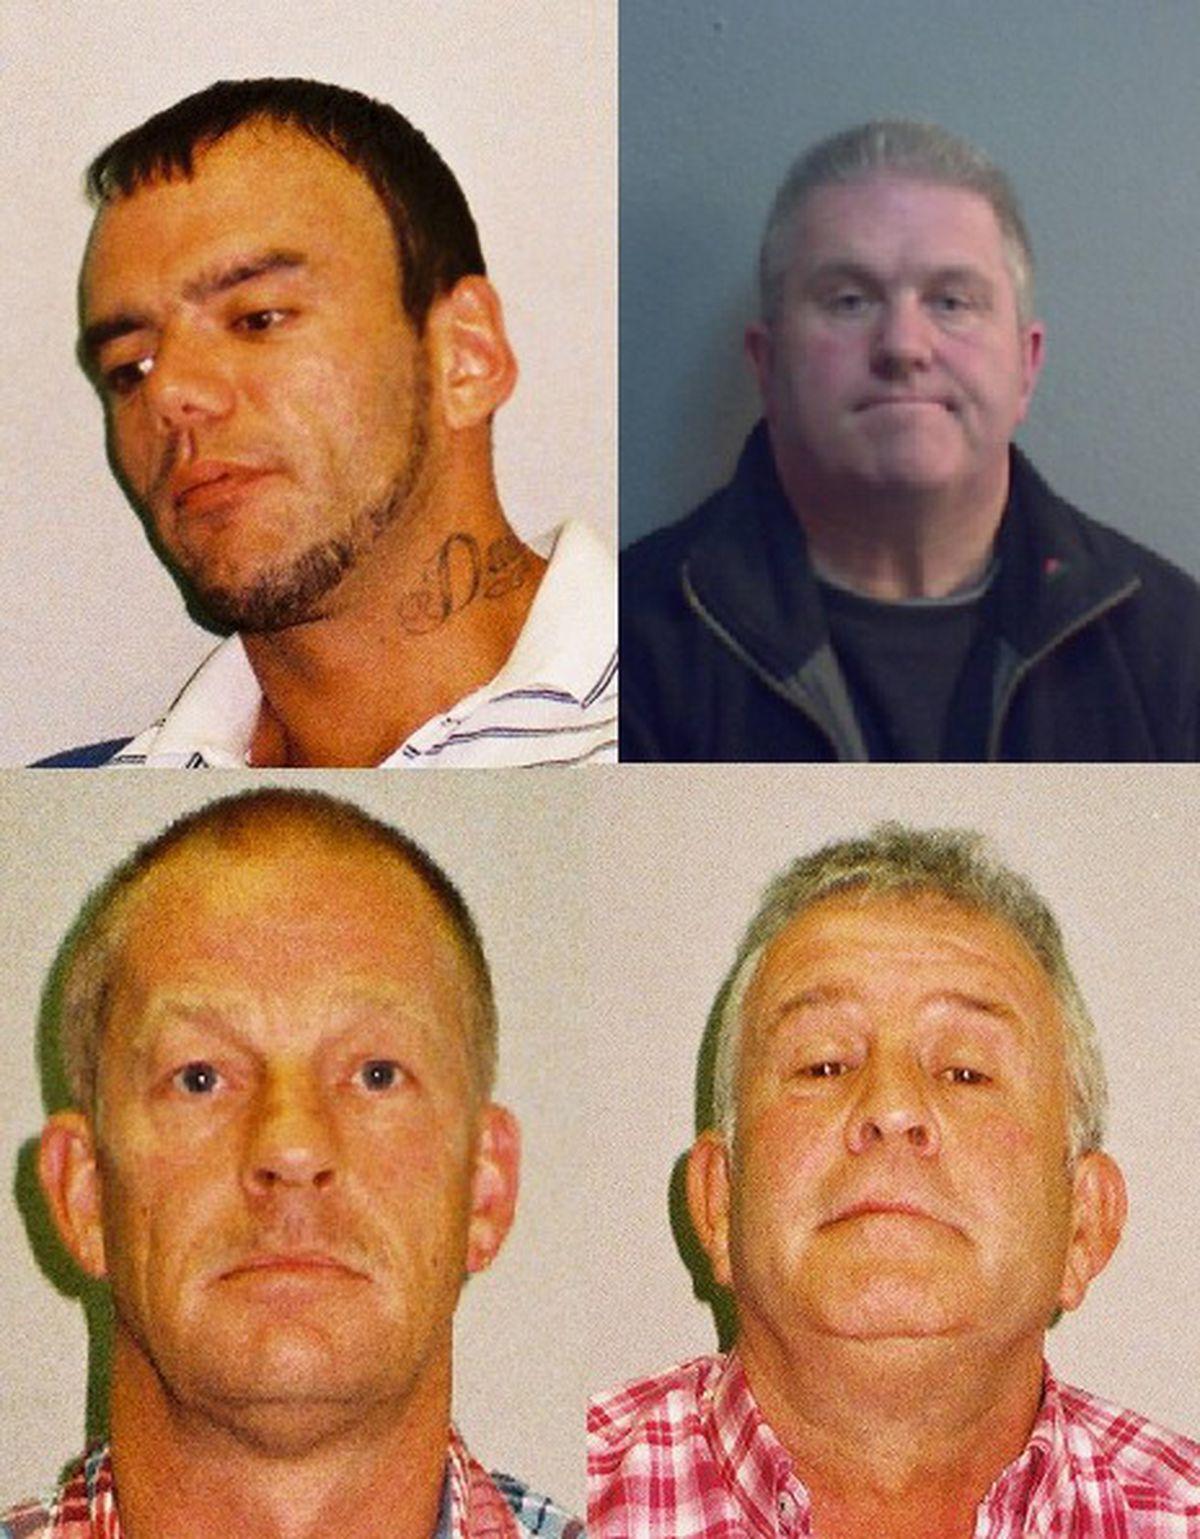 Top L-R George Dennis Powell, Simon David Wicks, Bottom L-R Layton Allan Davies, Paul Wells